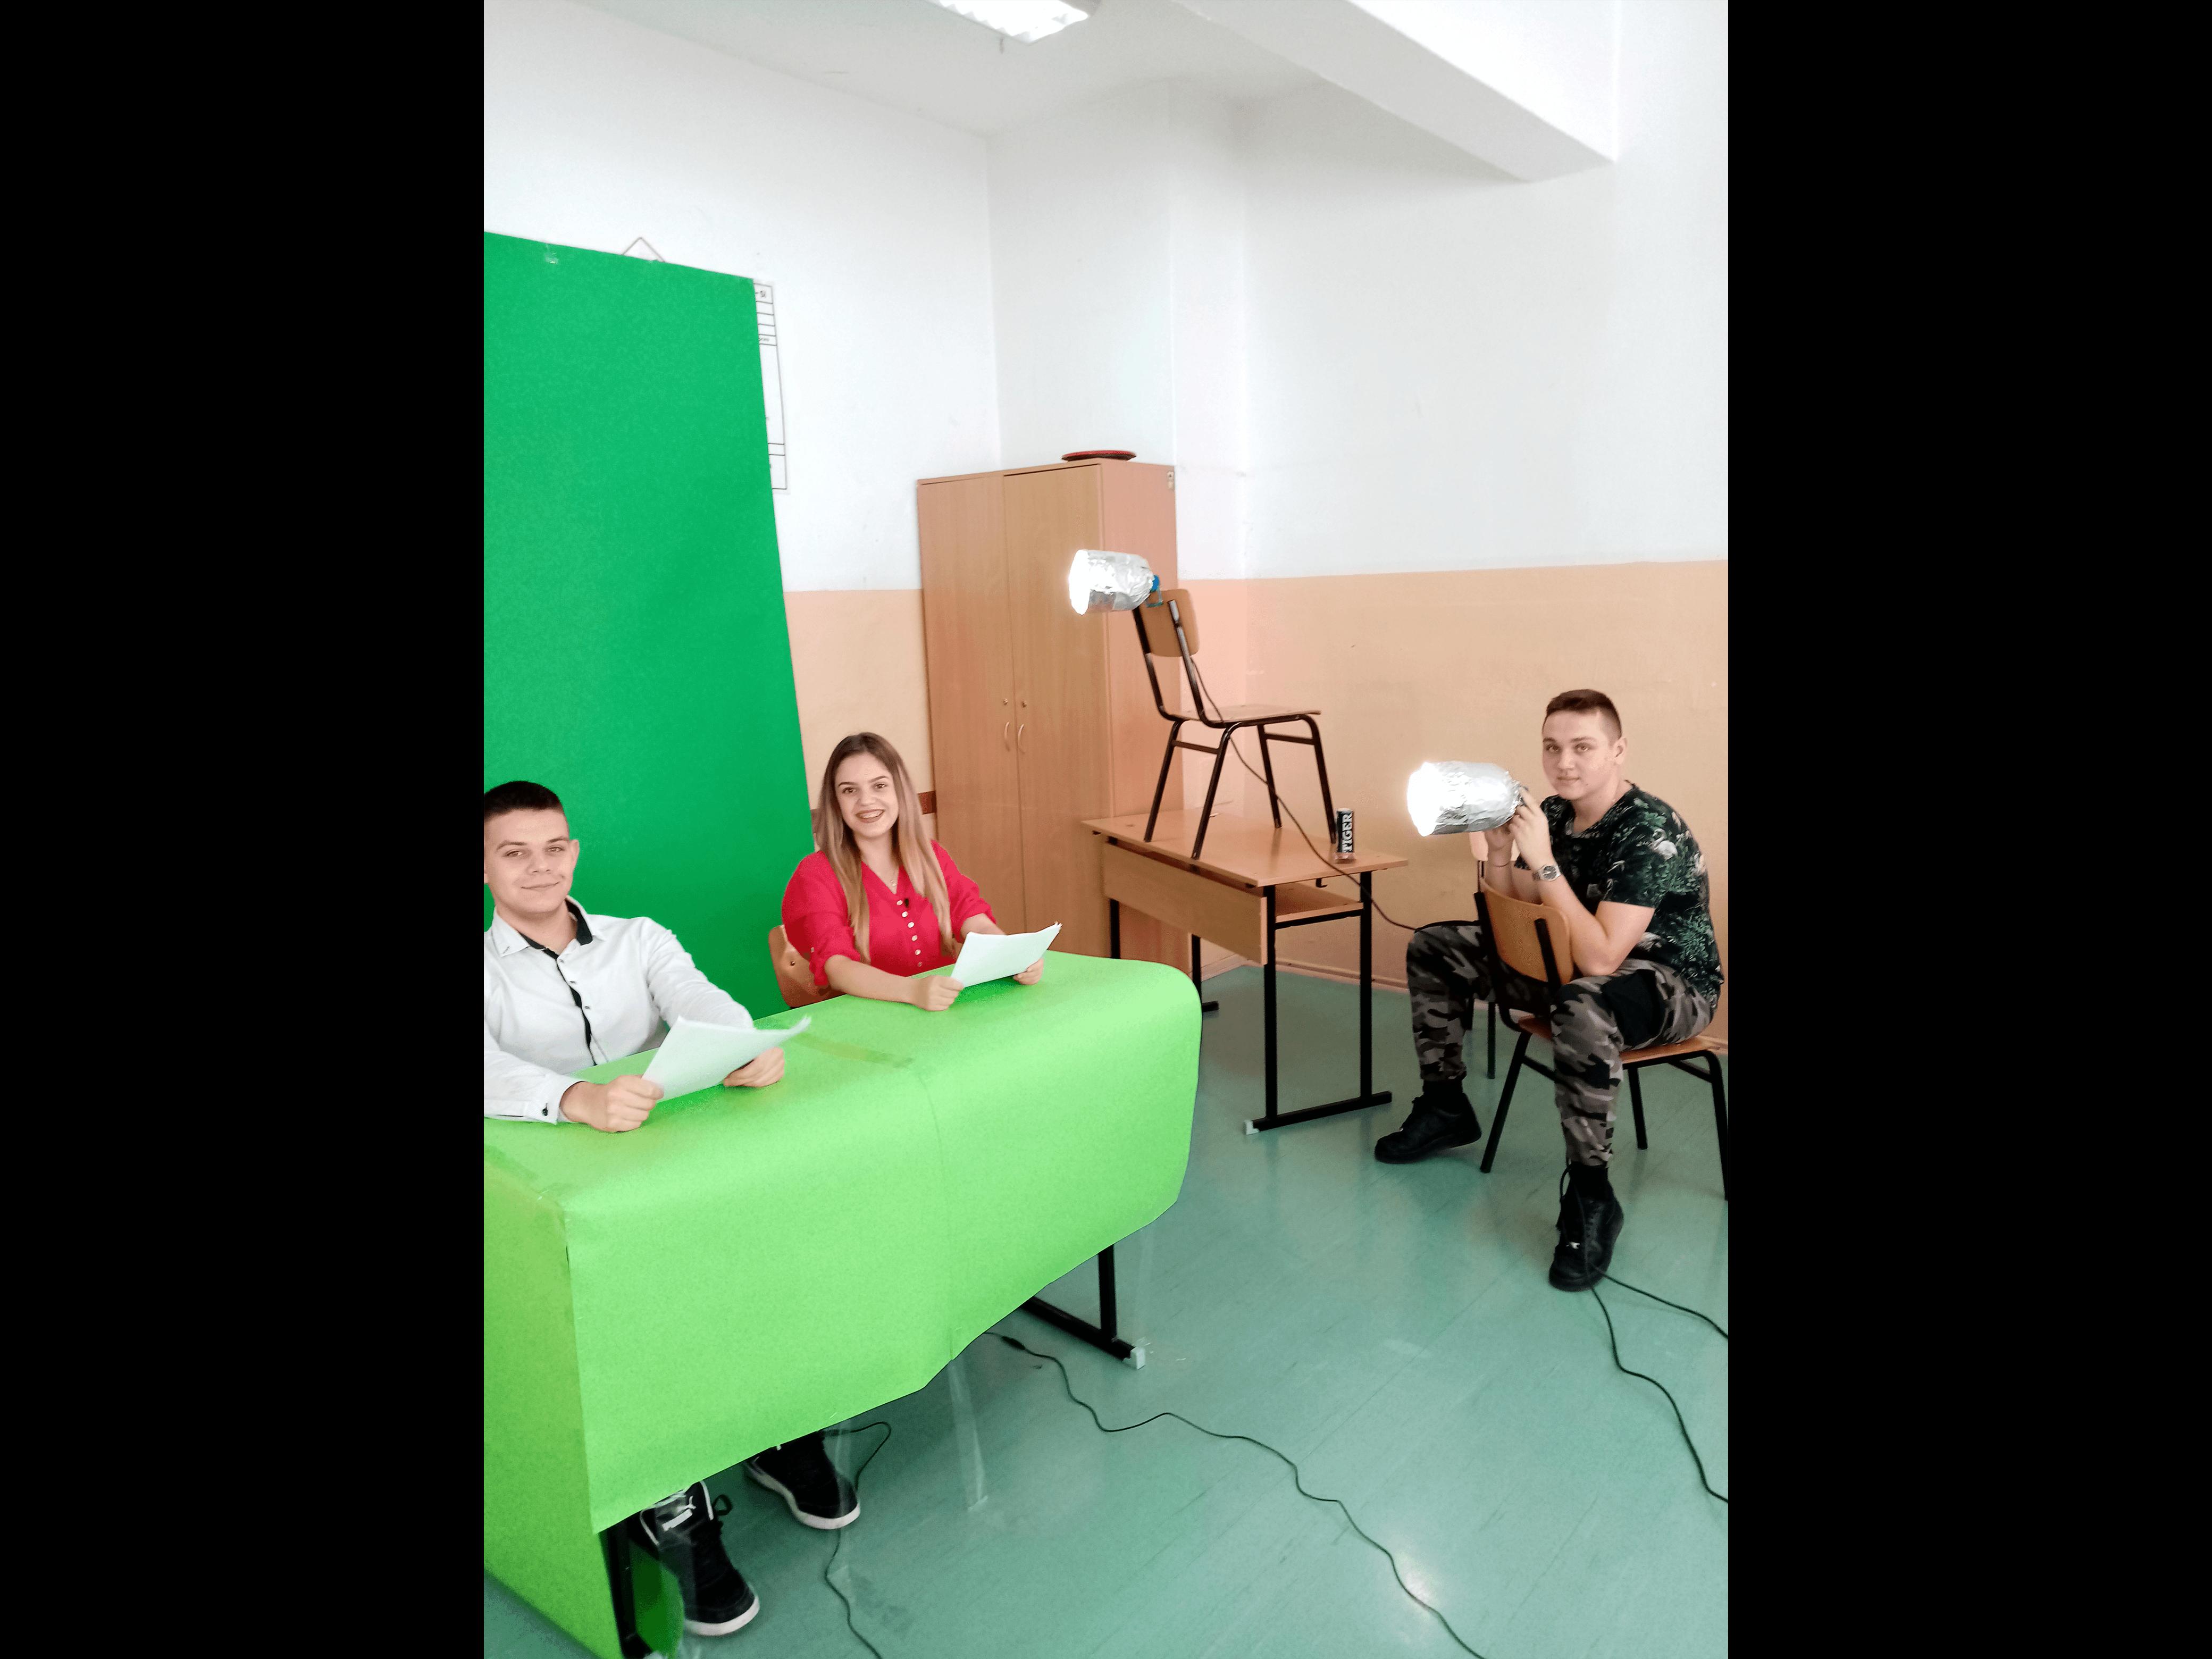 Slide 5 - ППМГ ТВ Сливен - Един ден на снимачната площадка